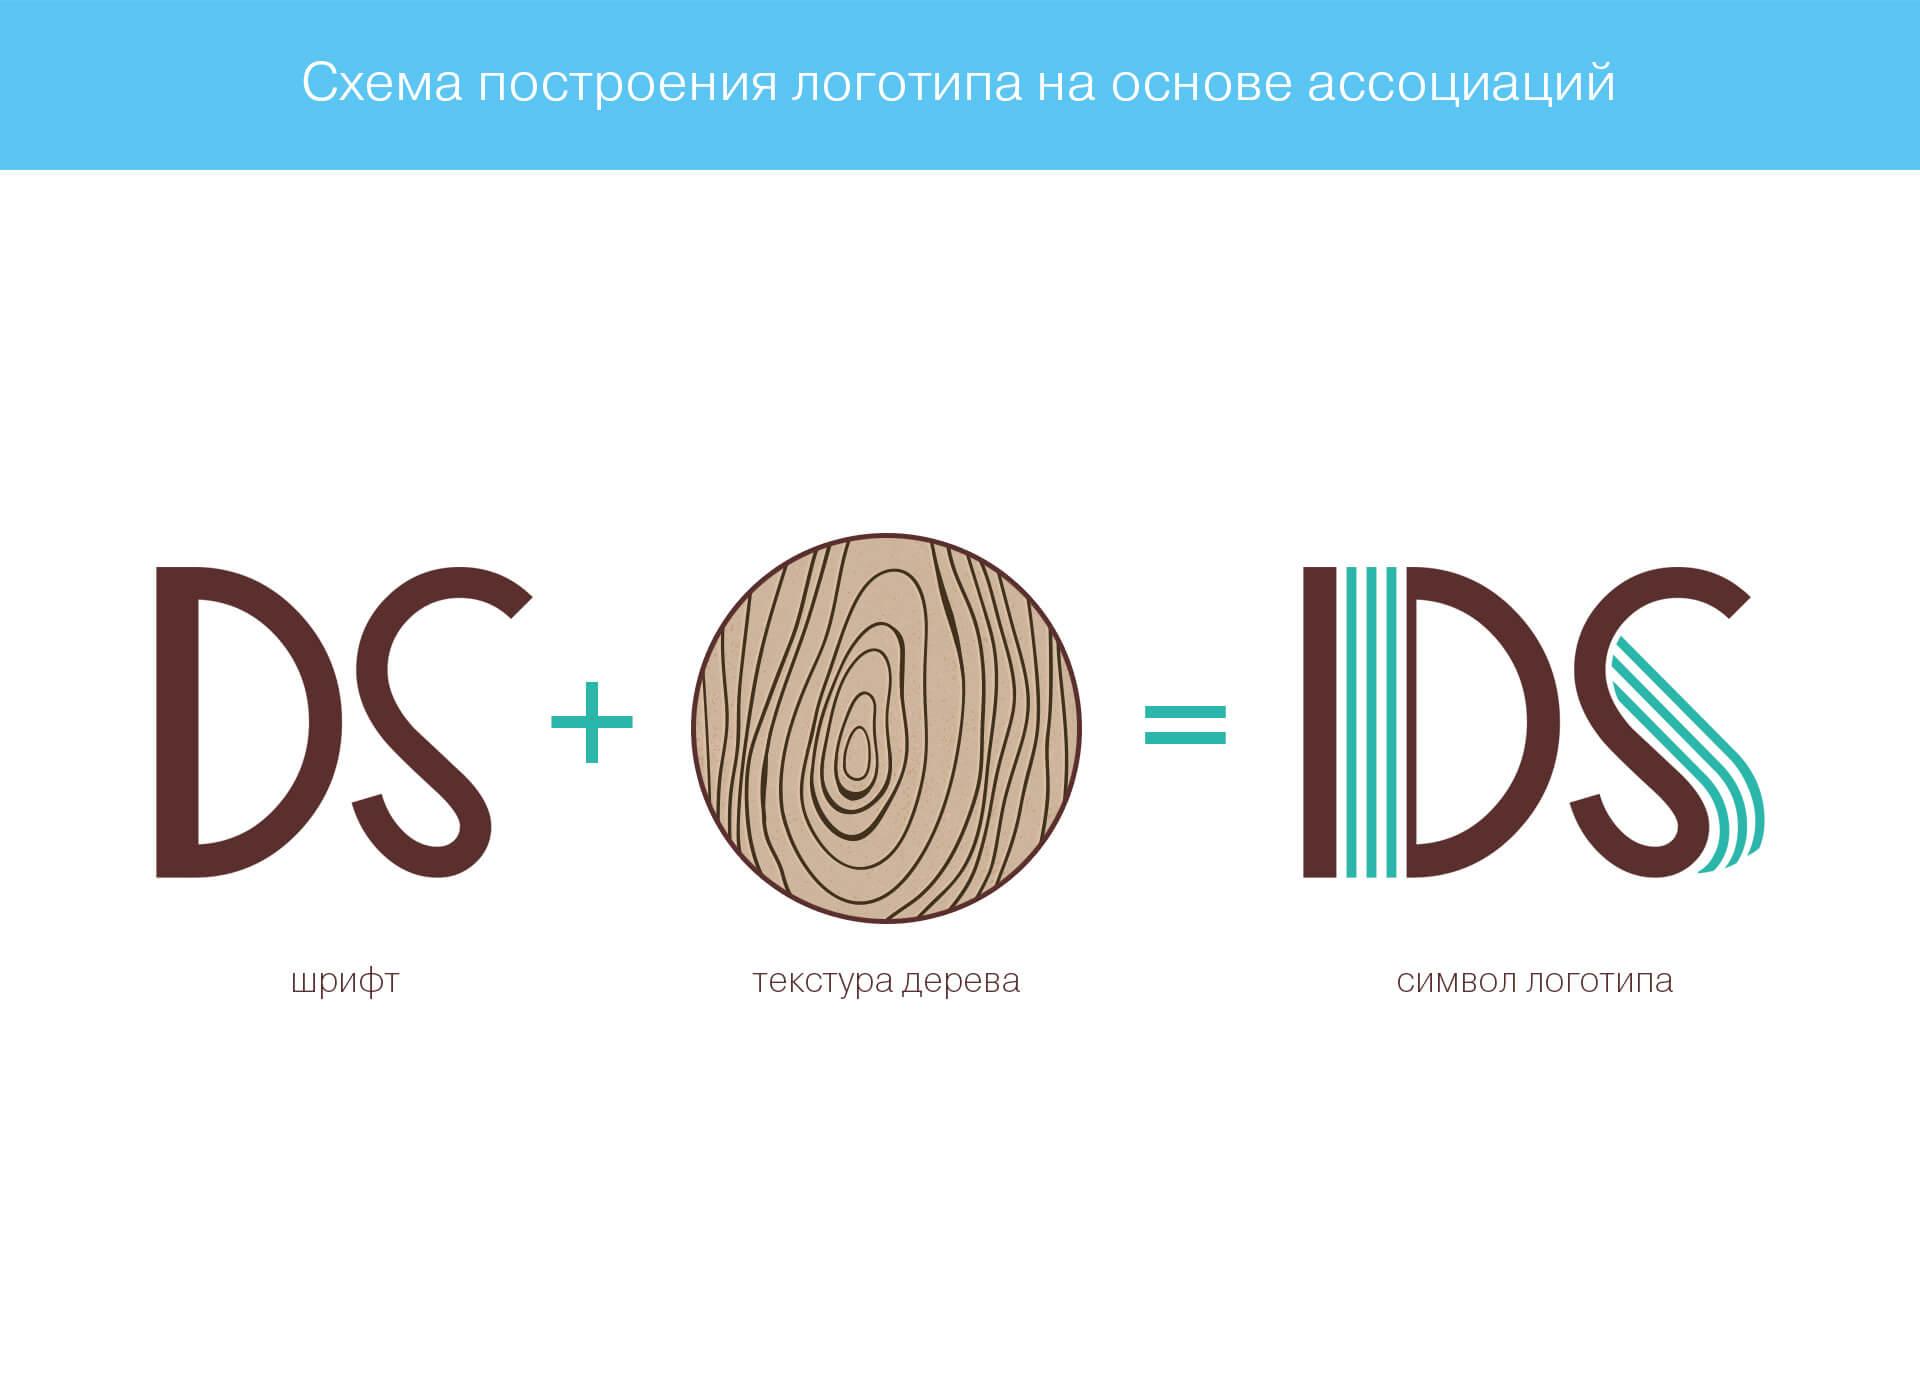 Prokochuk_Irina_Design-S_2_